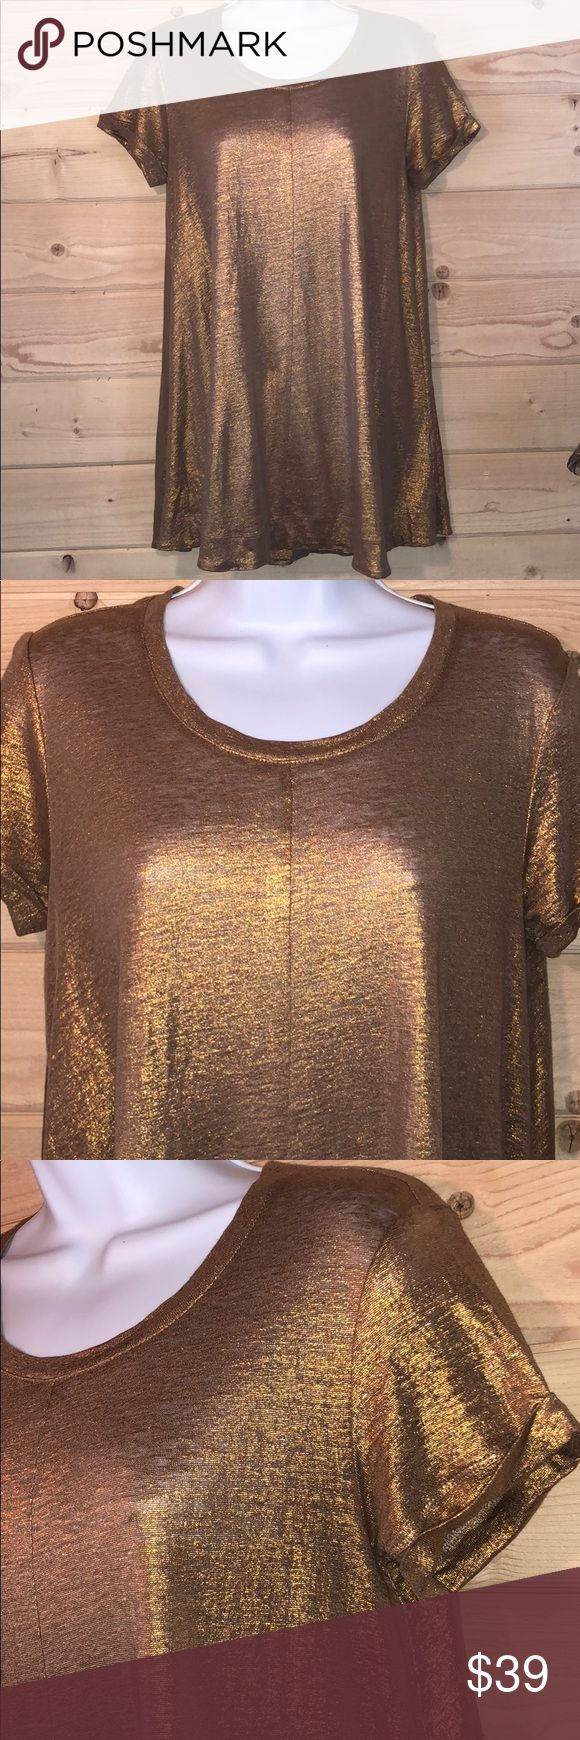 Bordeaux Metallic Copper Top/Tunic Dress Gorgeous! Excellent condition see photos. Anthropologie Dresses